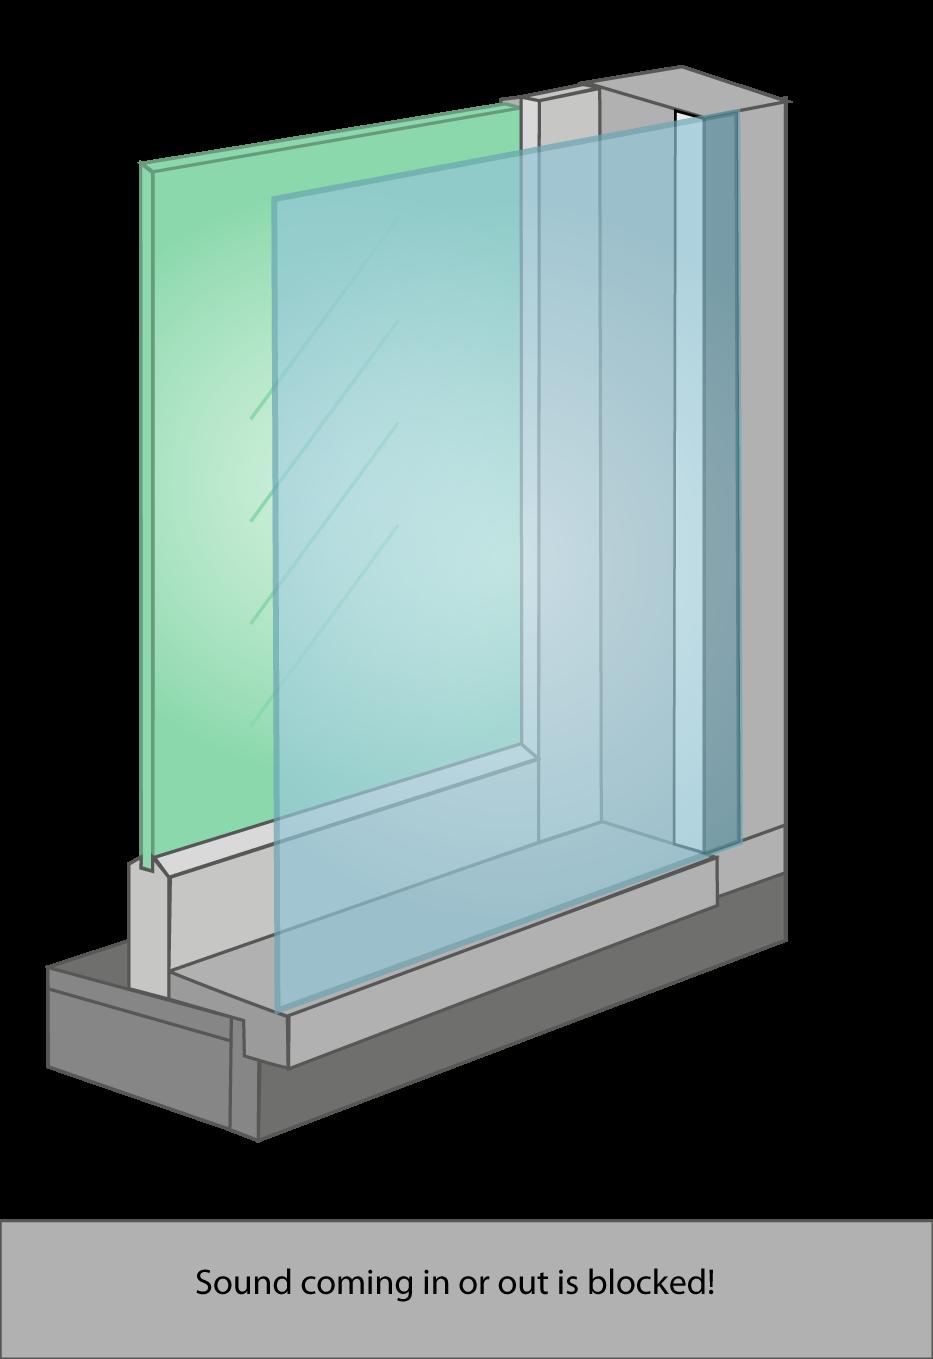 Secondary Magnaseal Window Soundproof Windows Music Studio Room Interior Windows